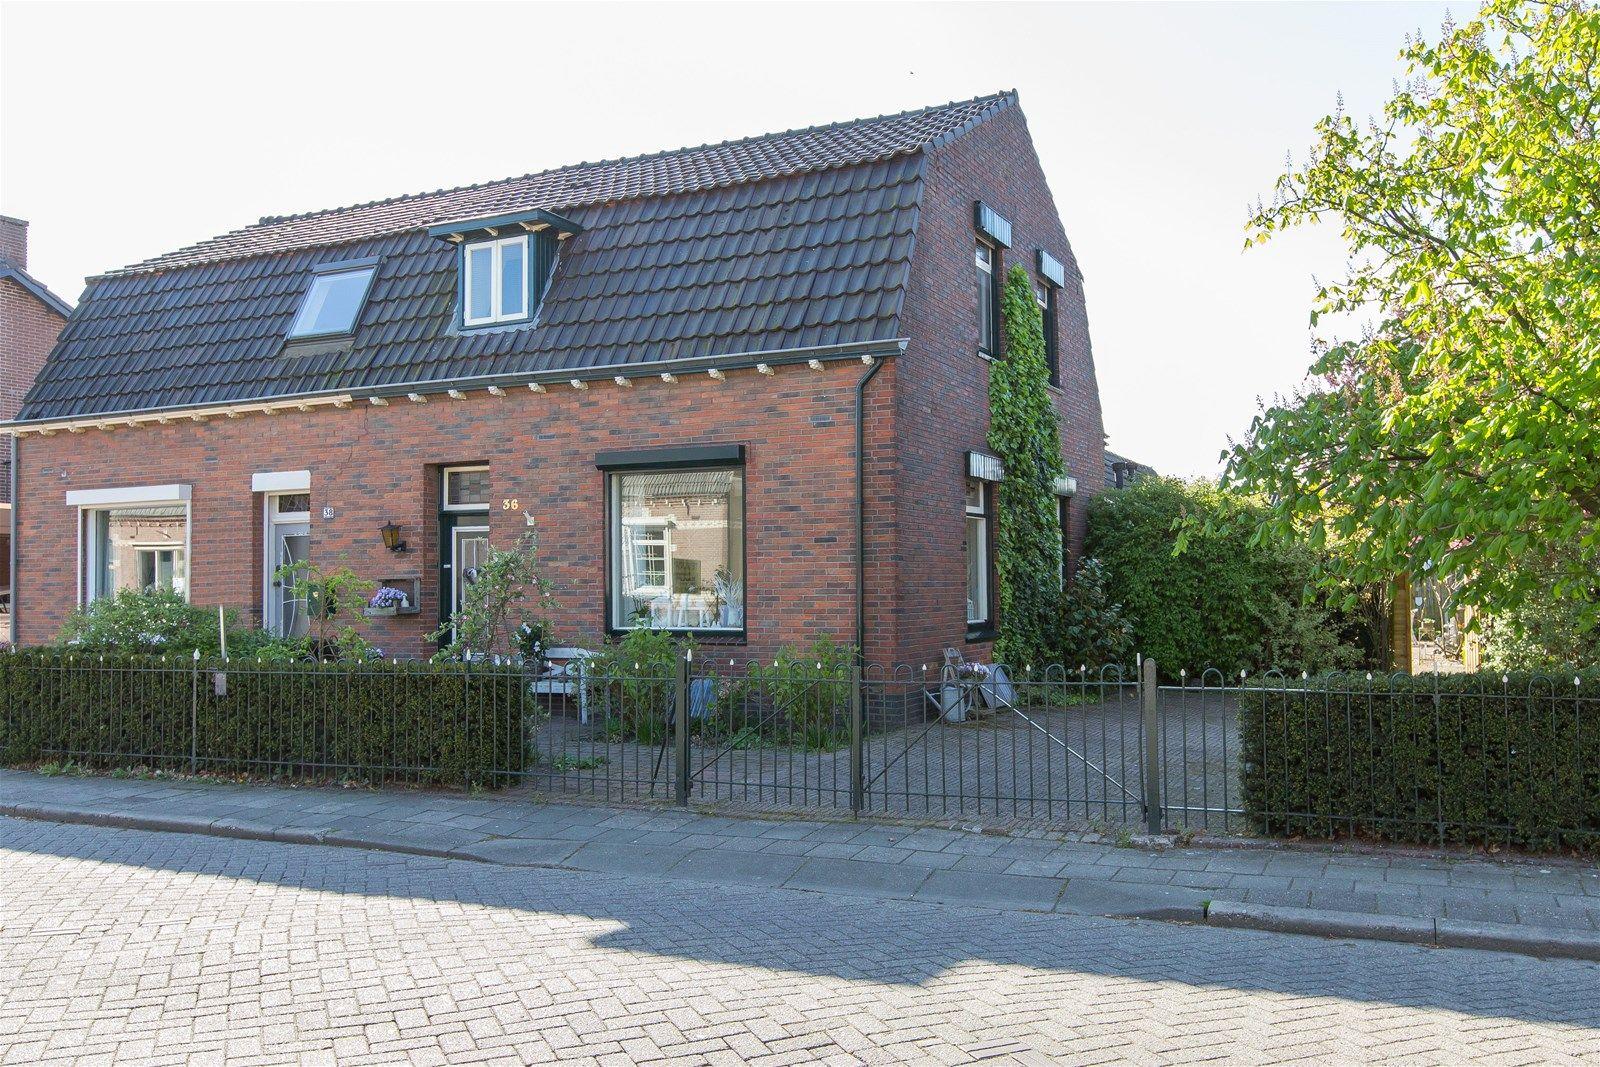 Oude Doetinchemseweg 36, 's-heerenberg